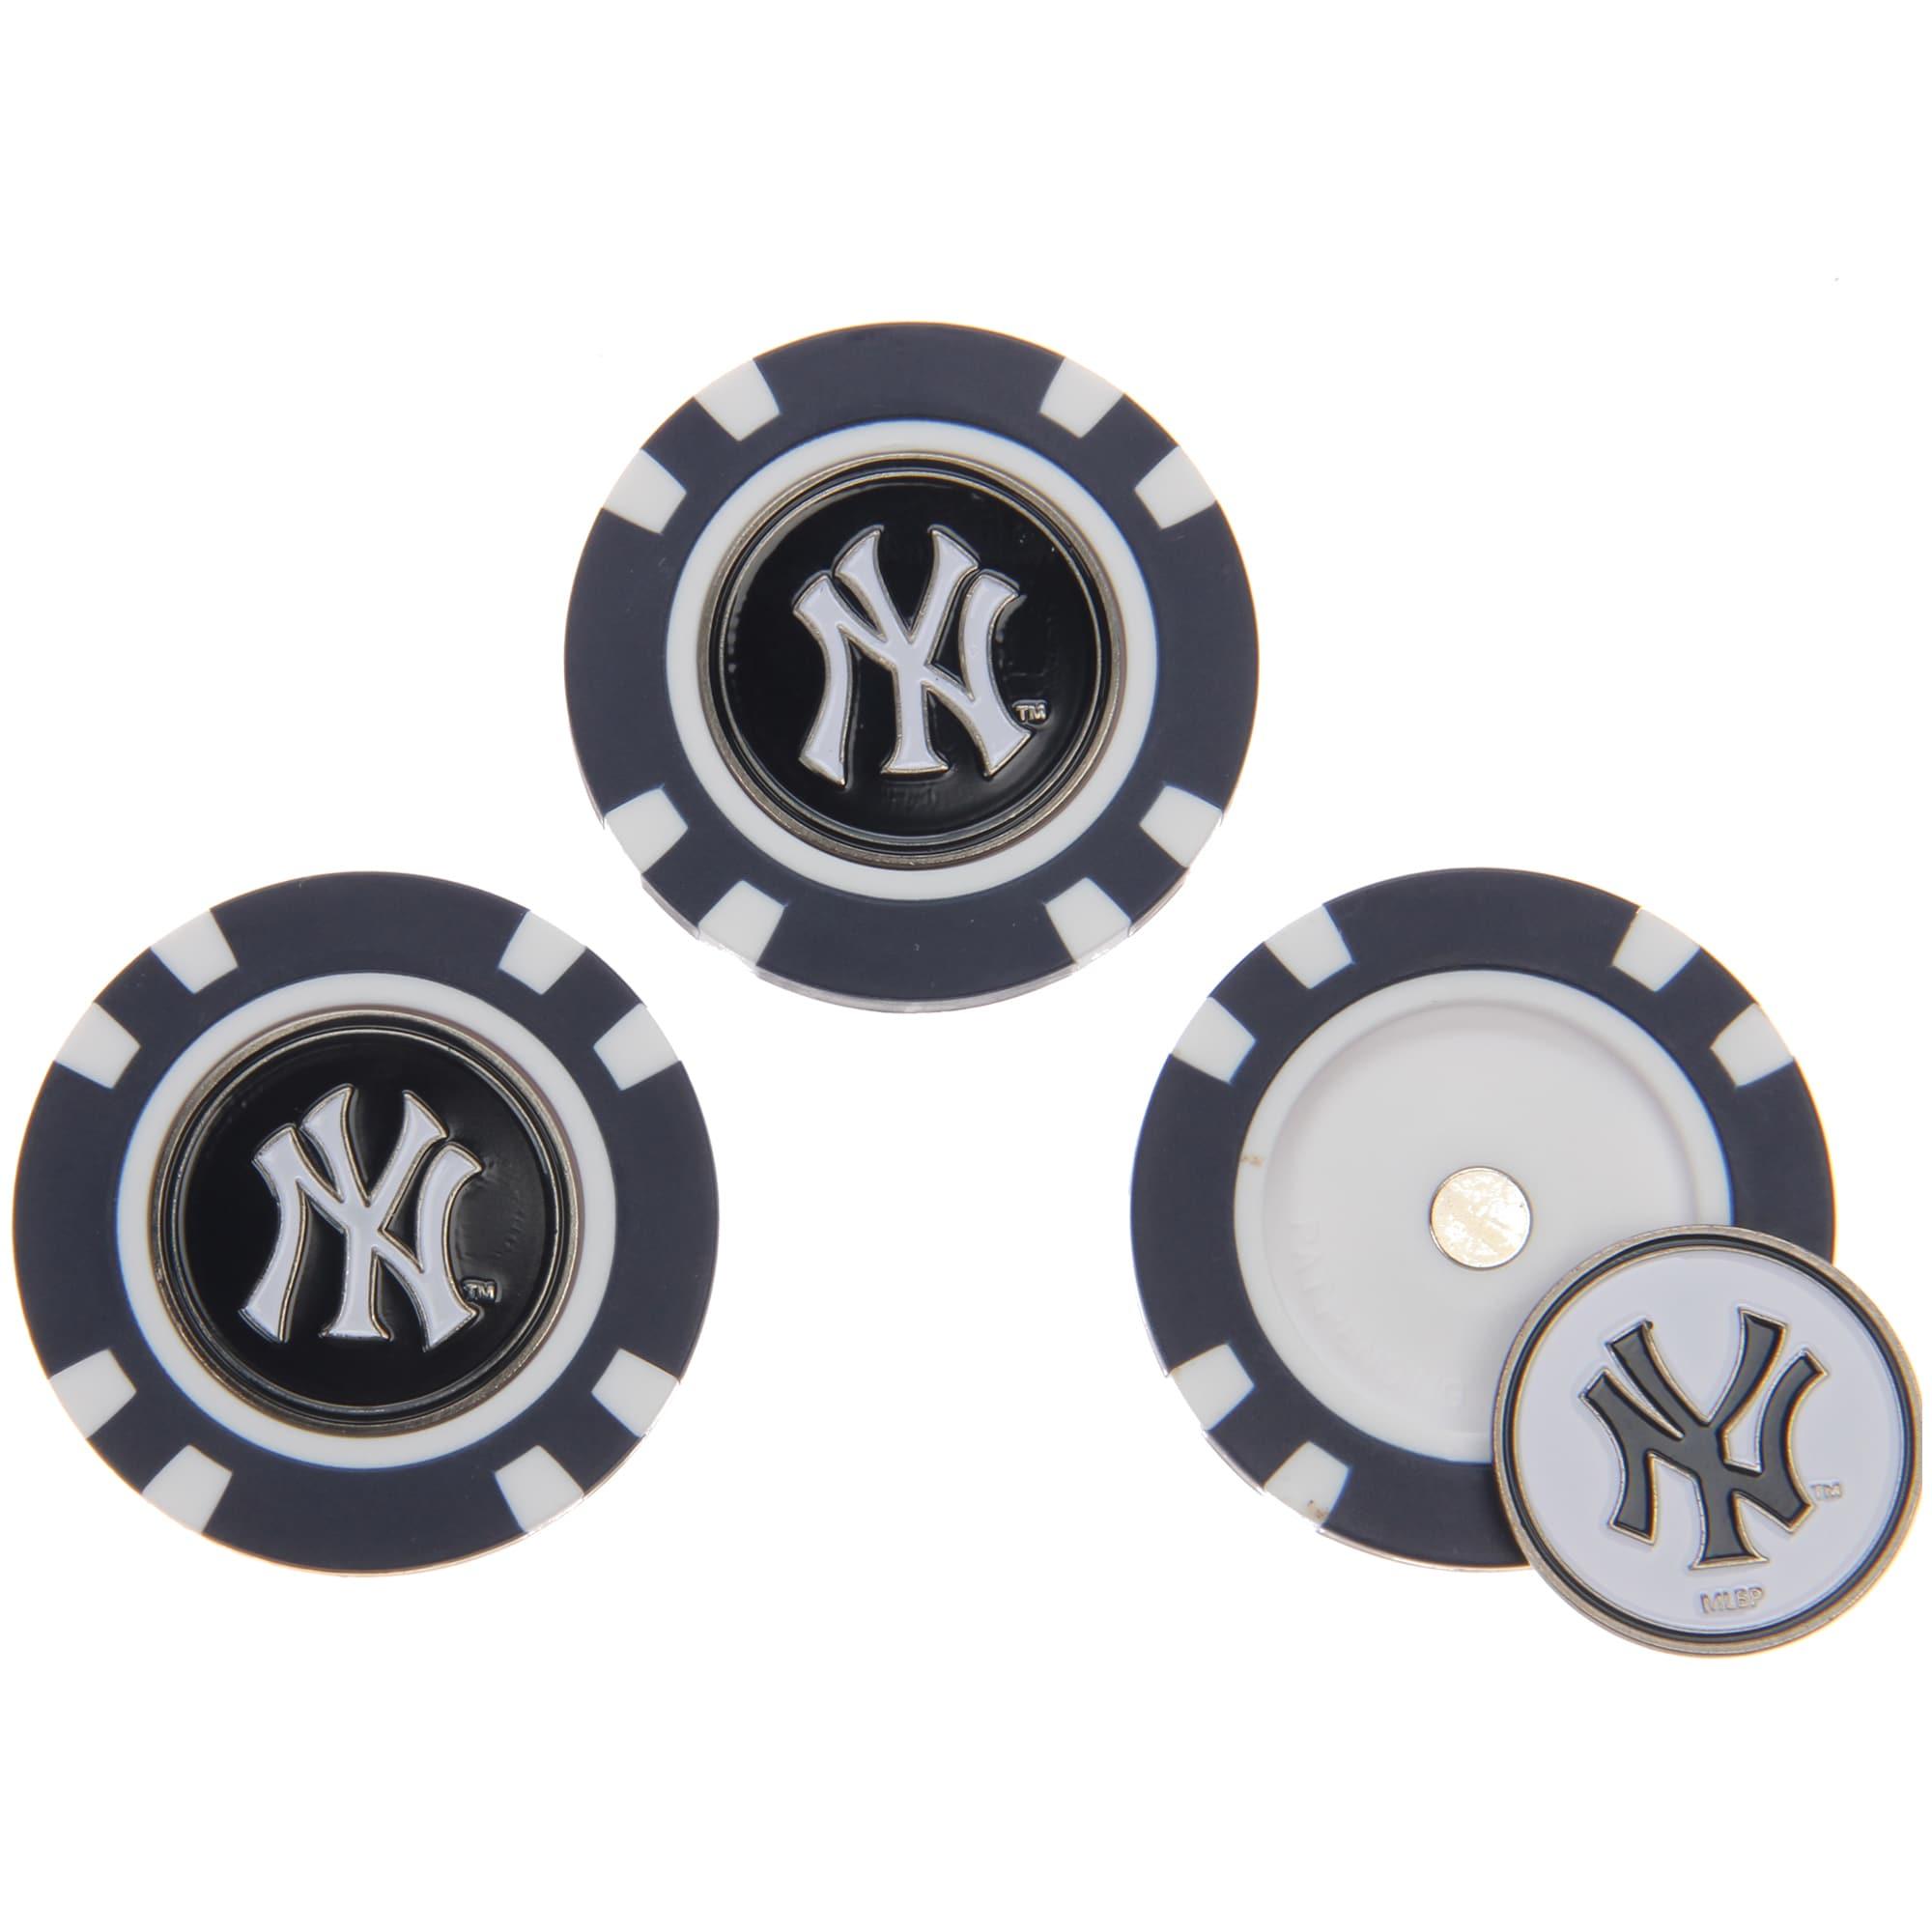 New York Yankees 3-Pack Poker Chip Golf Ball Markers